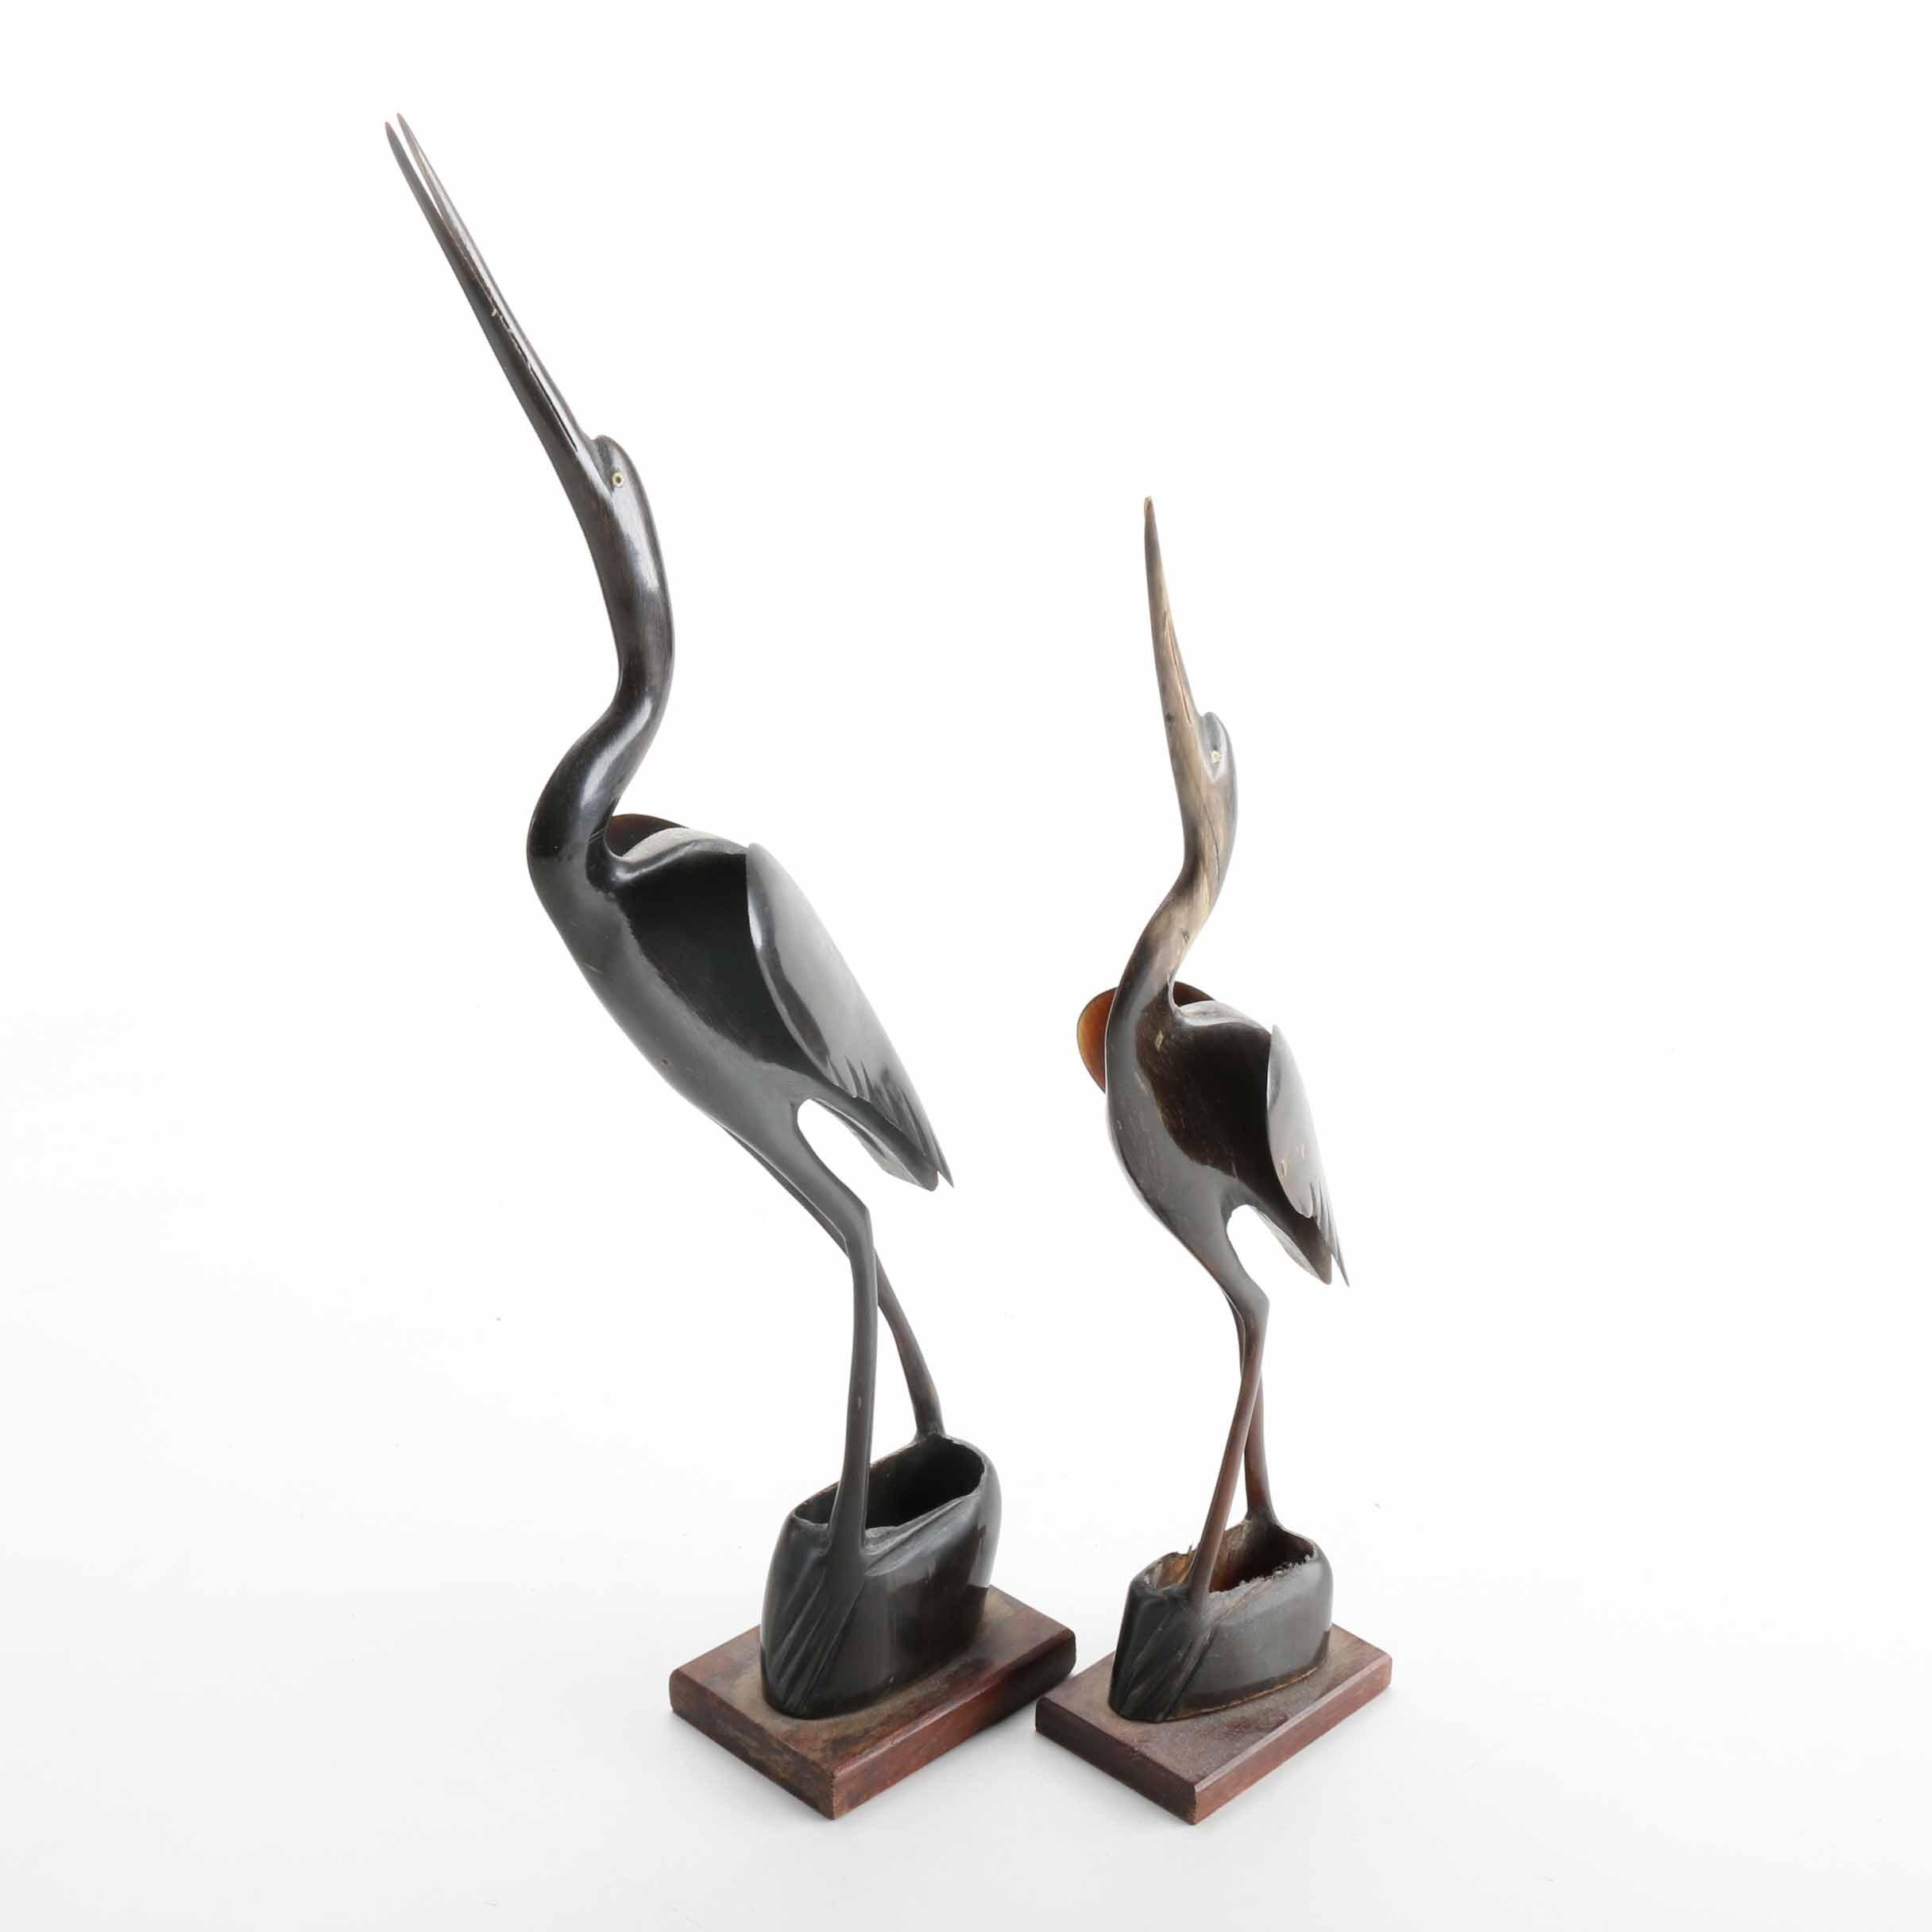 Carved Wood Stork Figurines